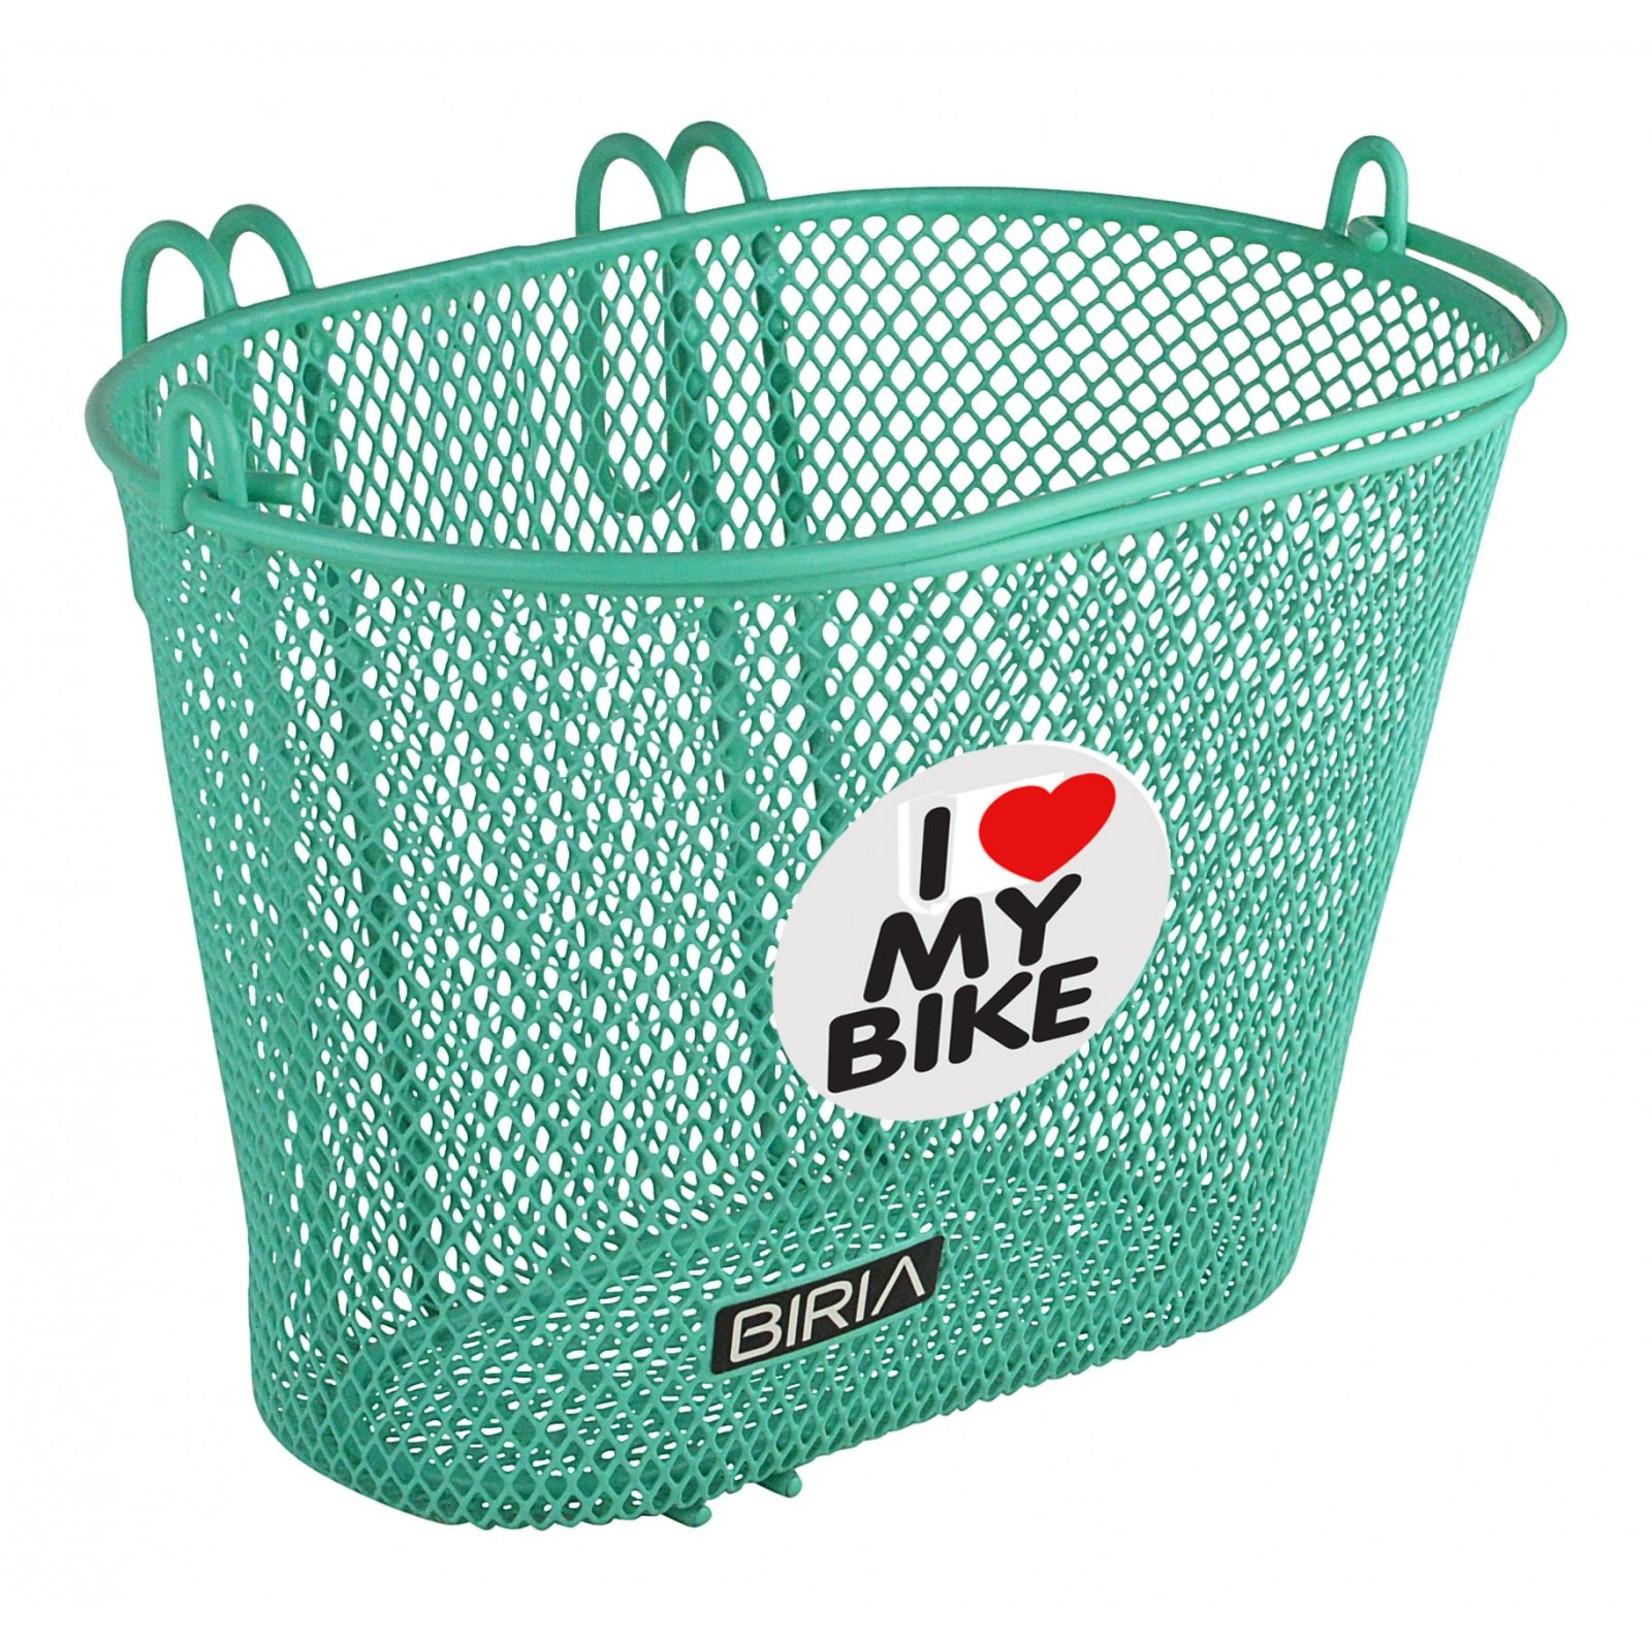 Biria Biria Children's Basket : I Love My Bike